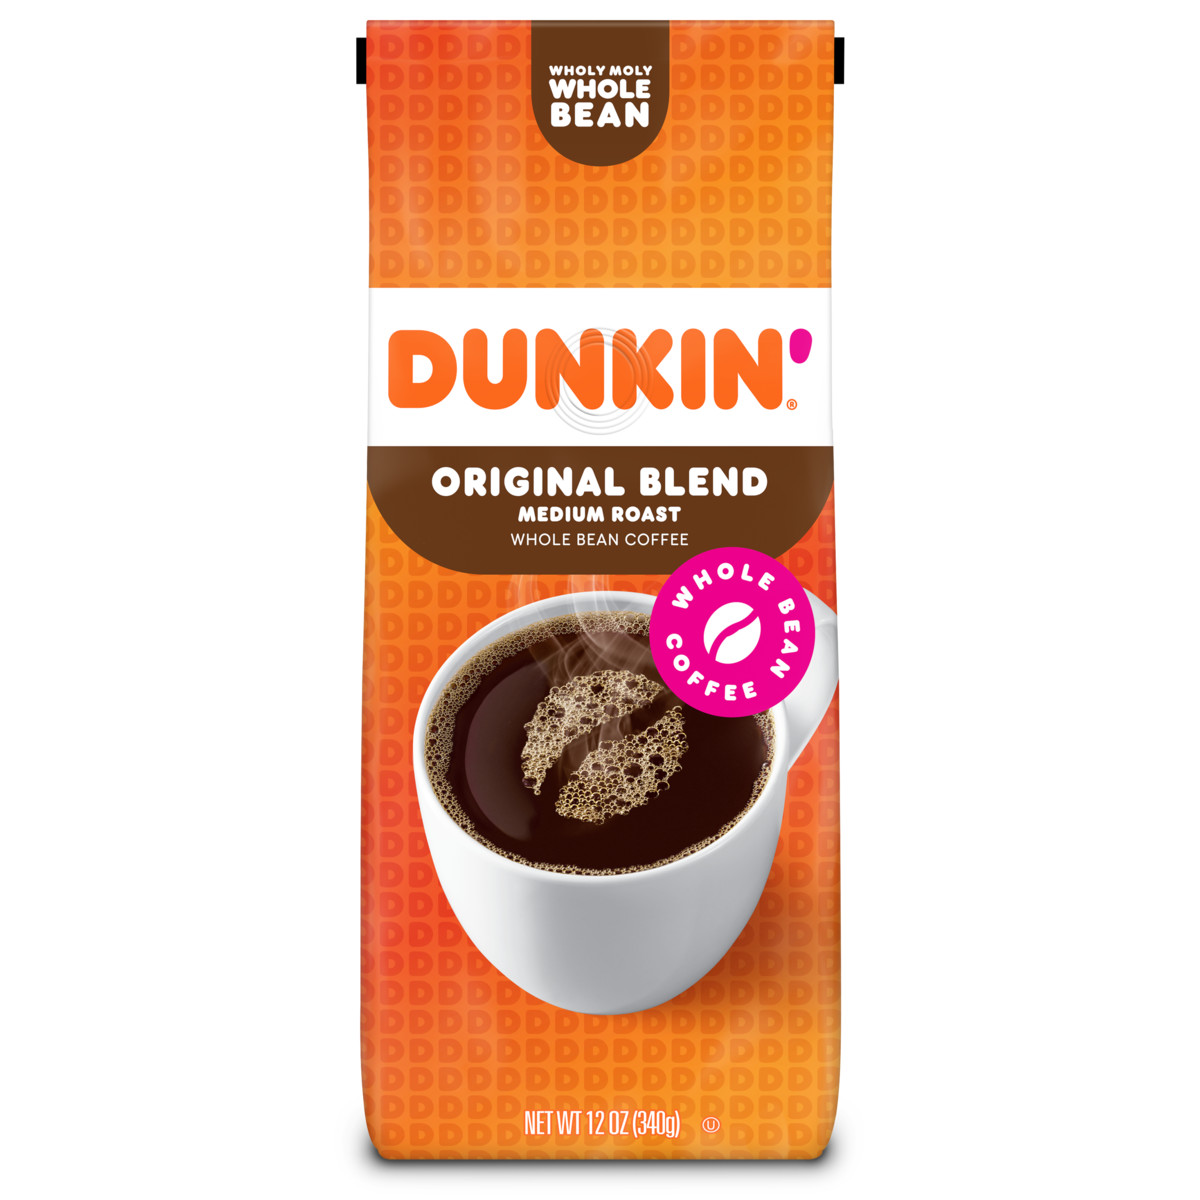 Original Blend Medium Roast Whole Bean Coffee